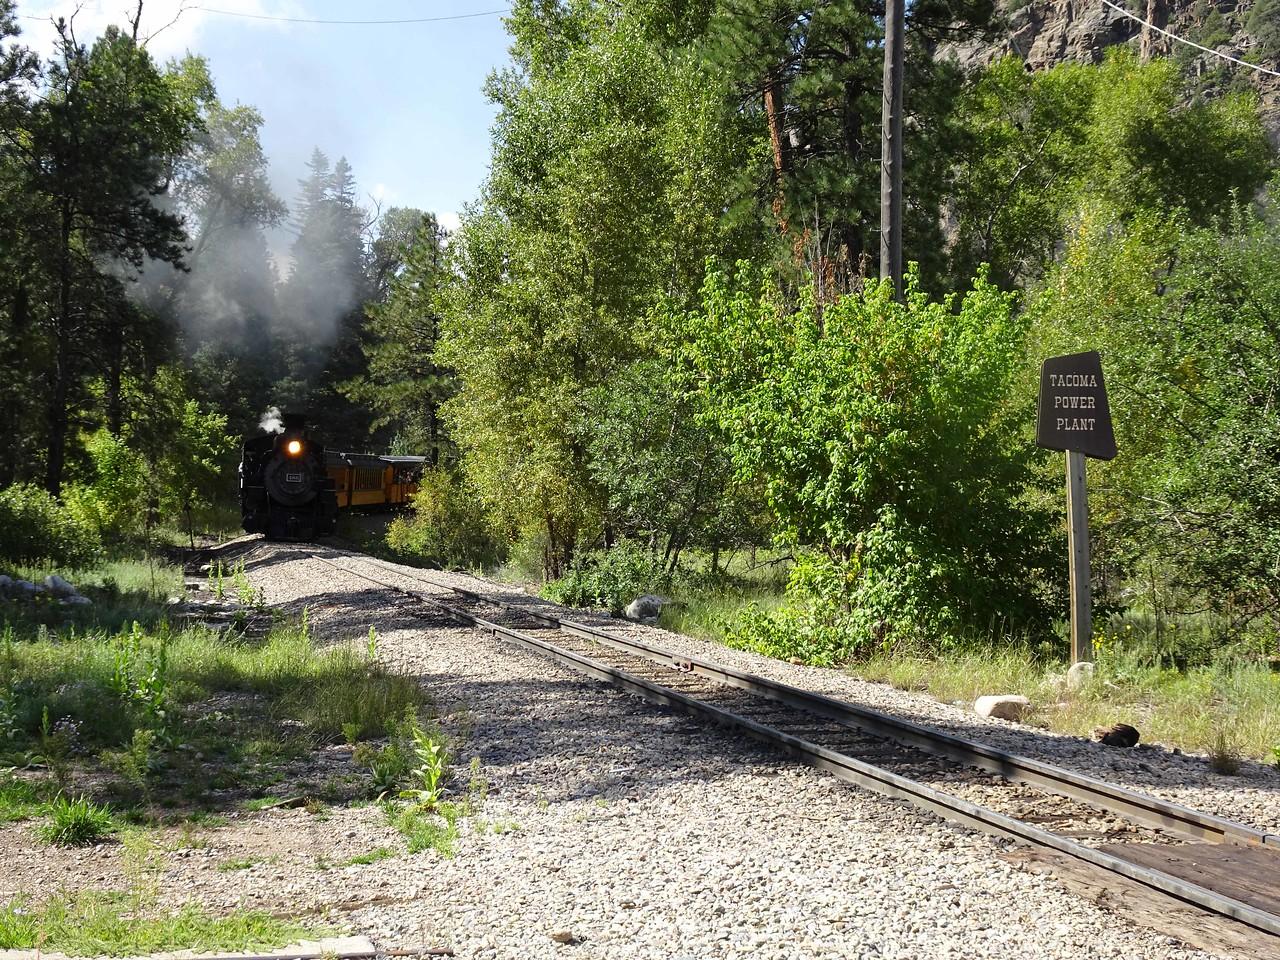 66 Here comes the train